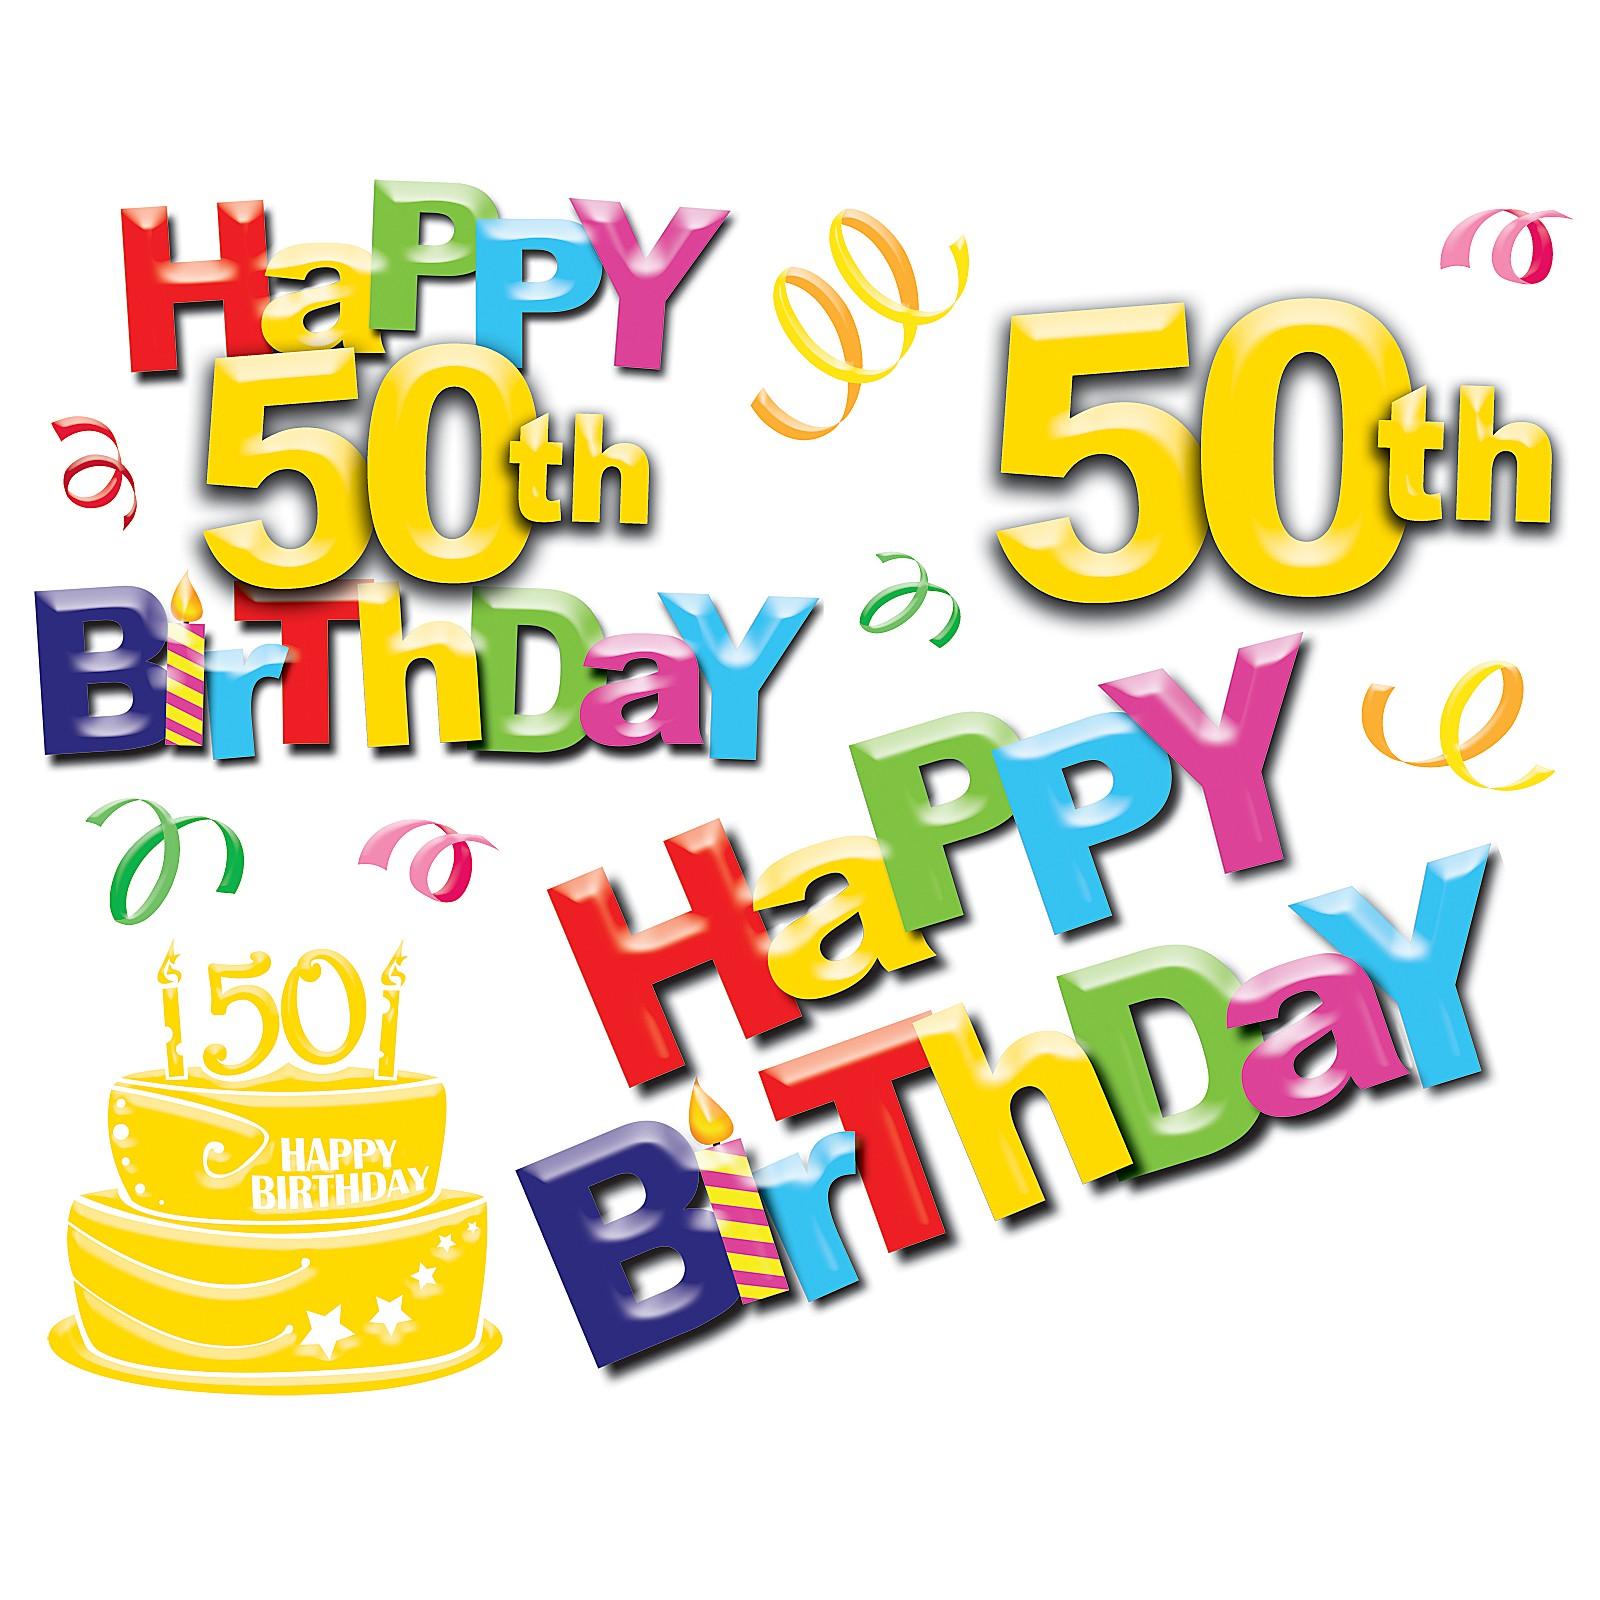 50th Birthday Clipart Clip Art ..-50th Birthday Clipart Clip Art ..-6